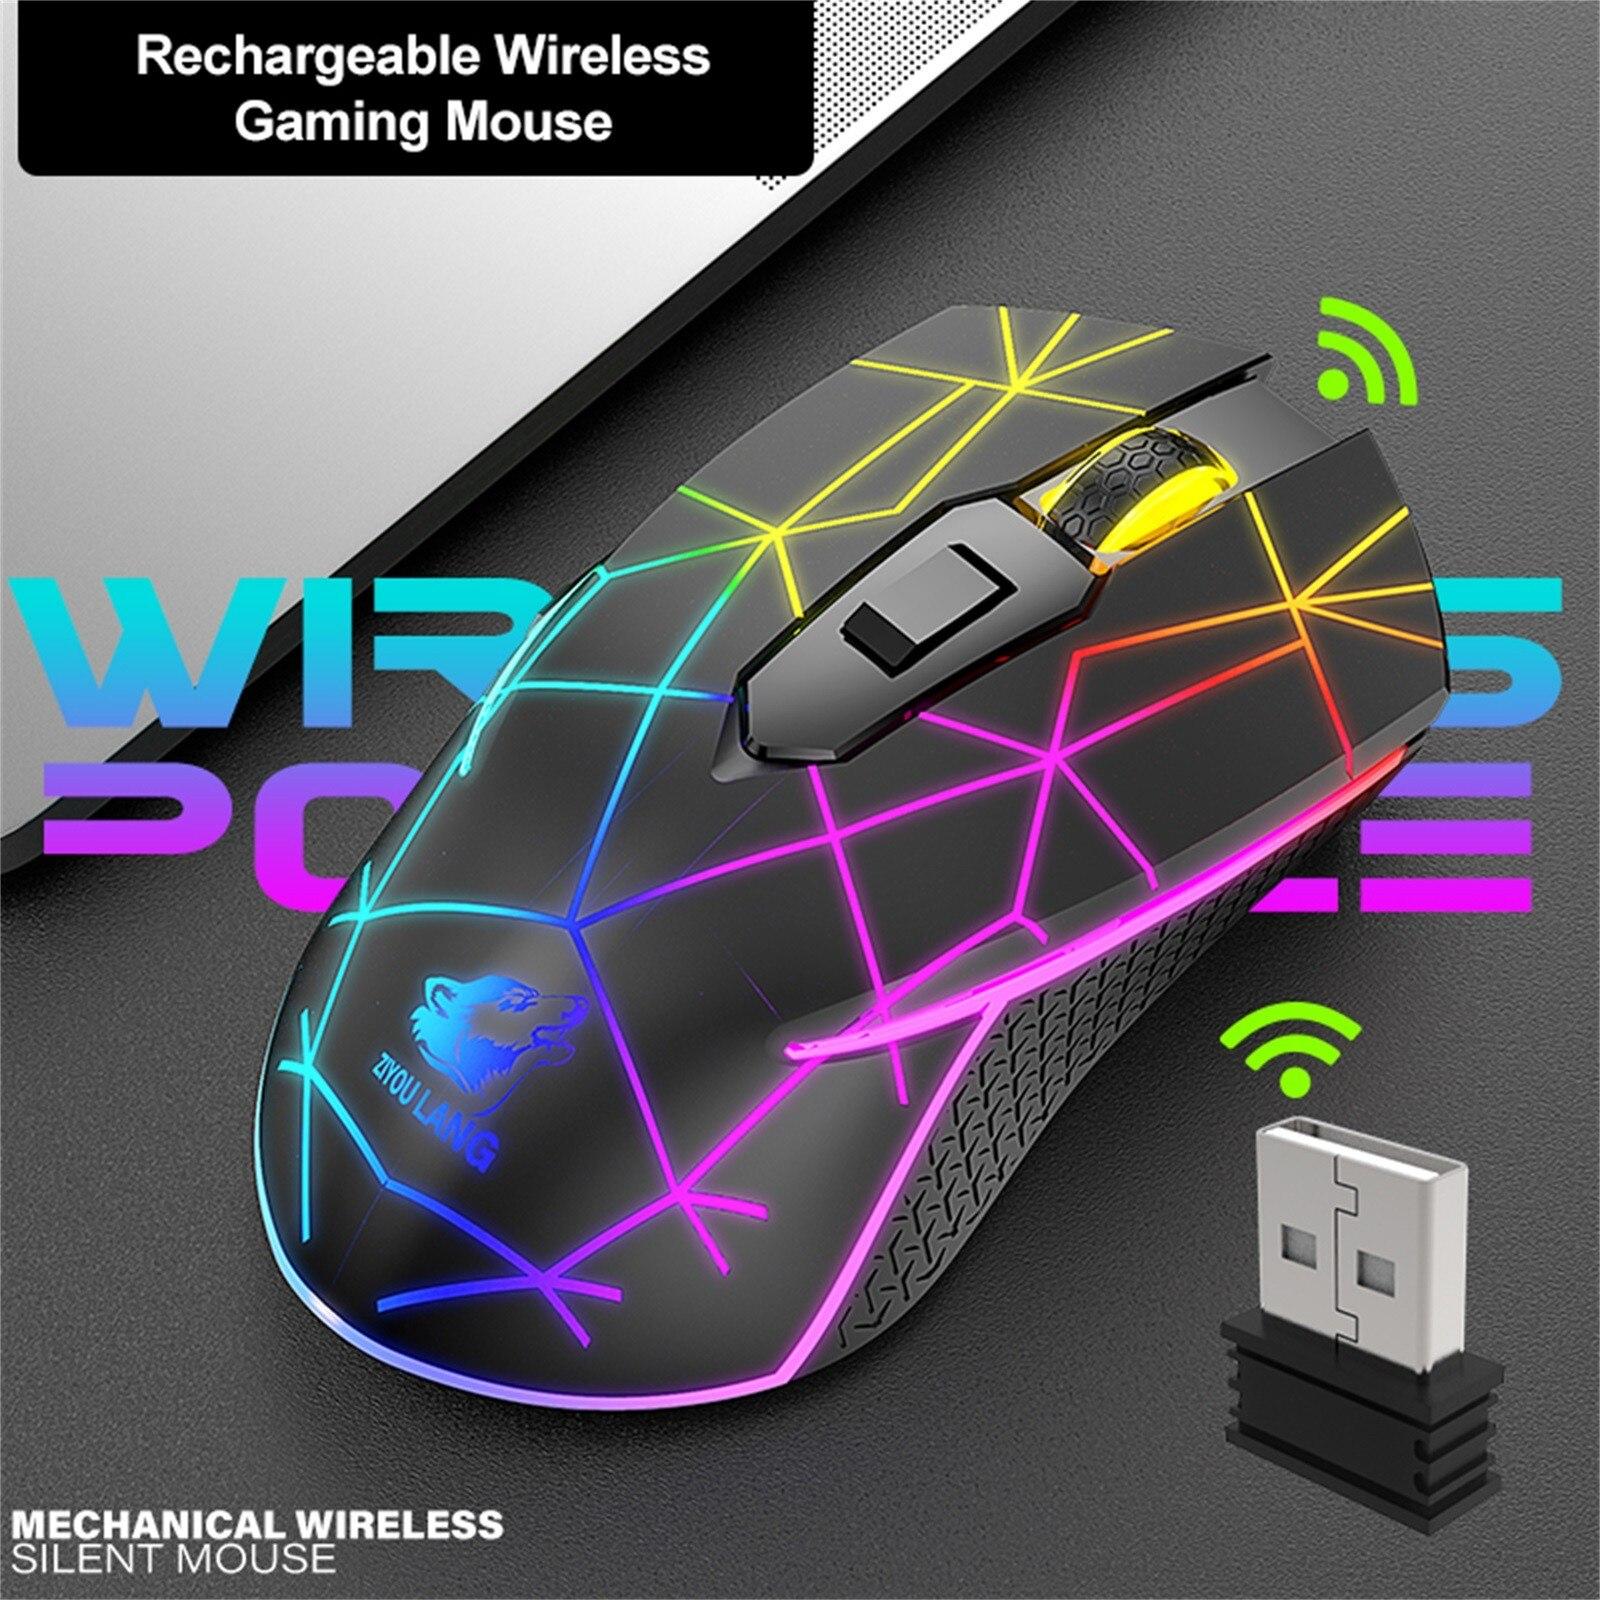 X9 اللاسلكية RGB الألعاب ماوس قابلة للشحن الصامت 2400 ديسيبل متوحد الخواص قابل للتعديل التوصيل والتشغيل 7 ألوان RGB تنفس ضوء الفئران البصرية